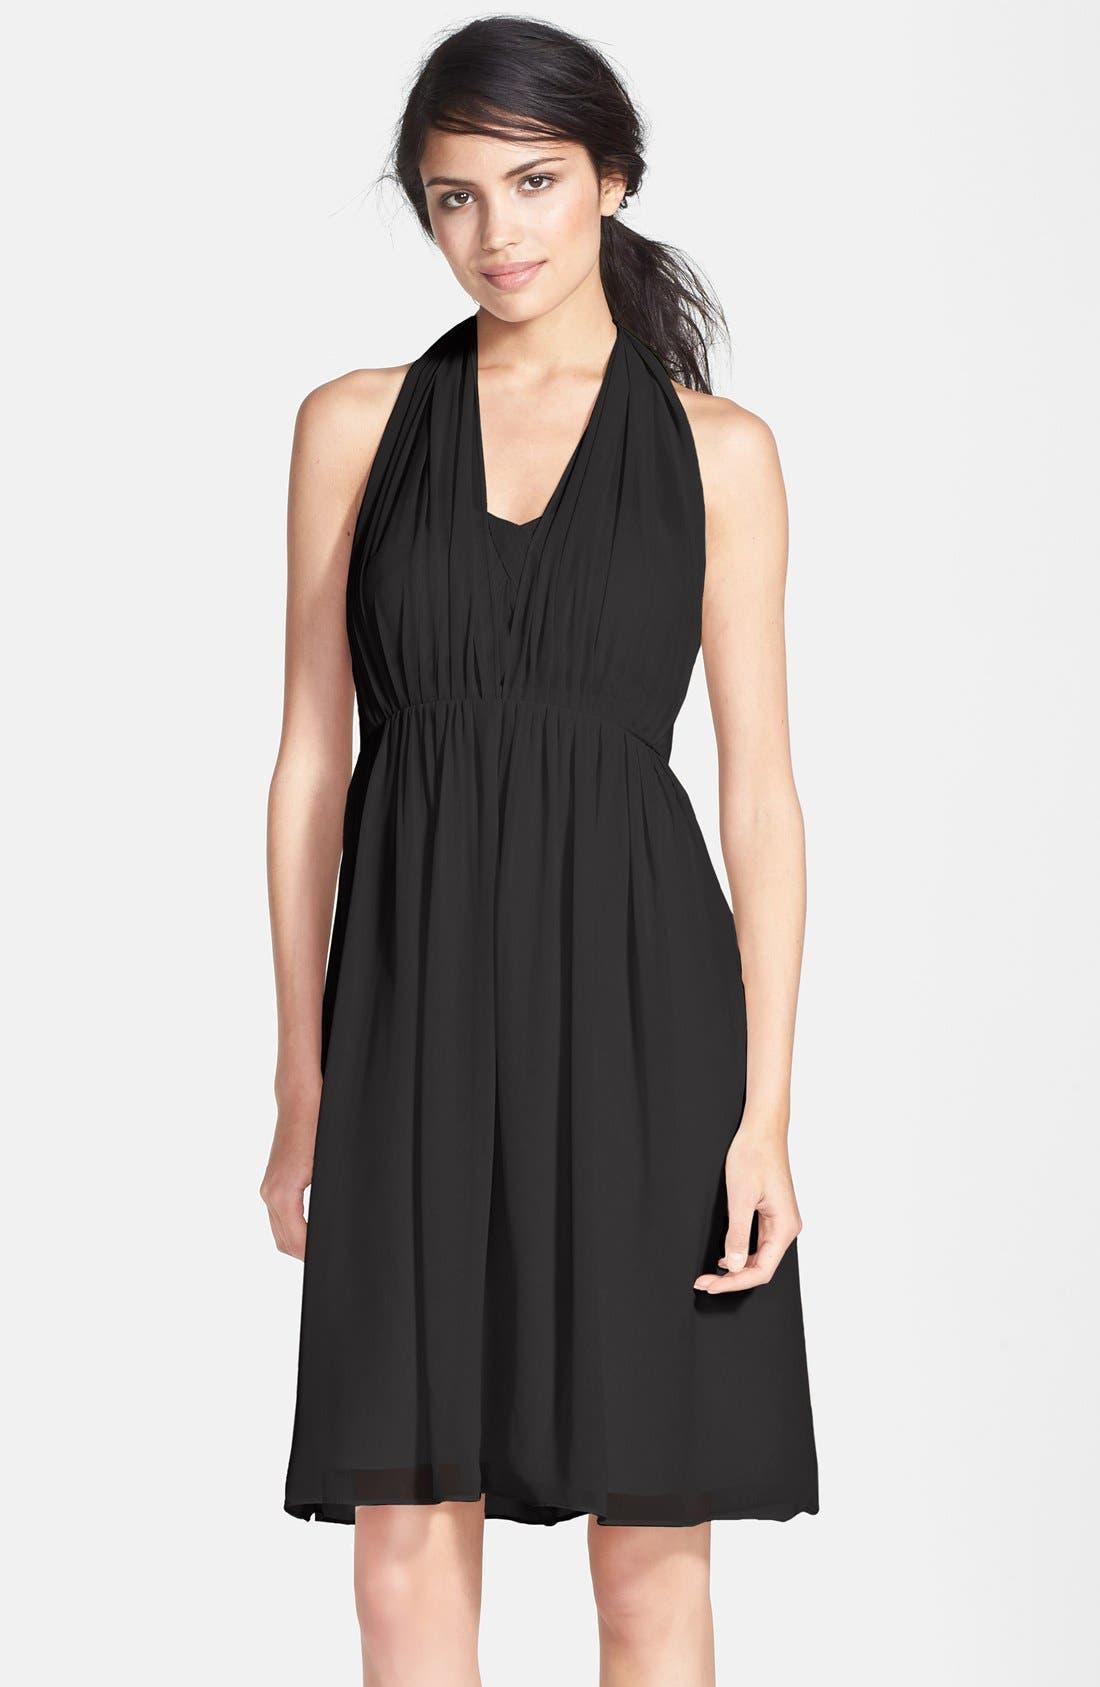 JENNY YOO Keira Convertible Strapless Chiffon Dress, Main, color, 001